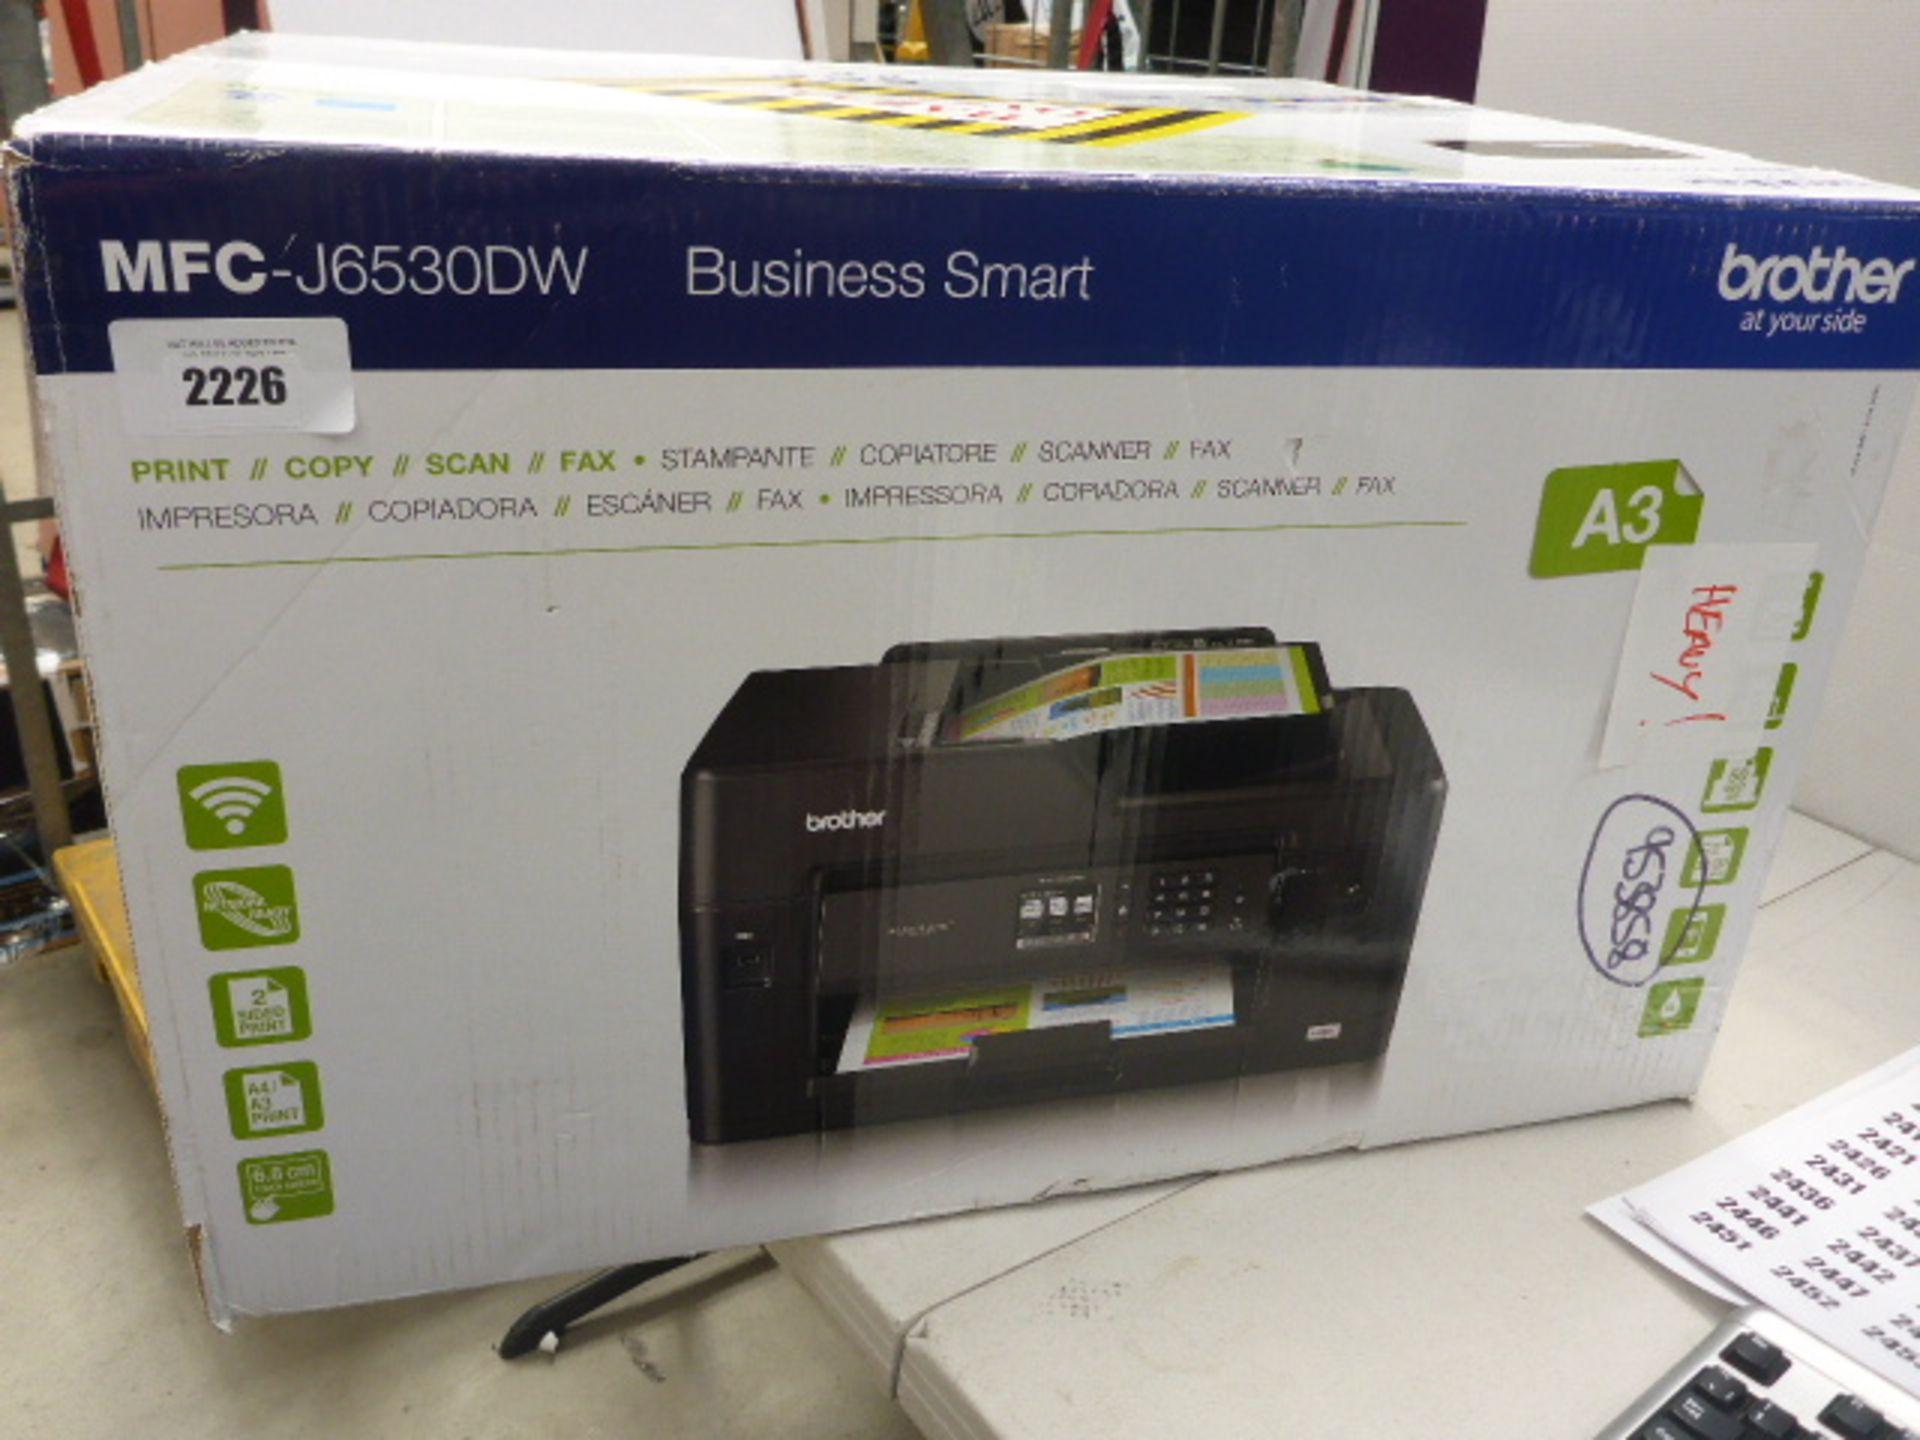 Lotto 2226 - Brother MFC J6530 smart printer in box